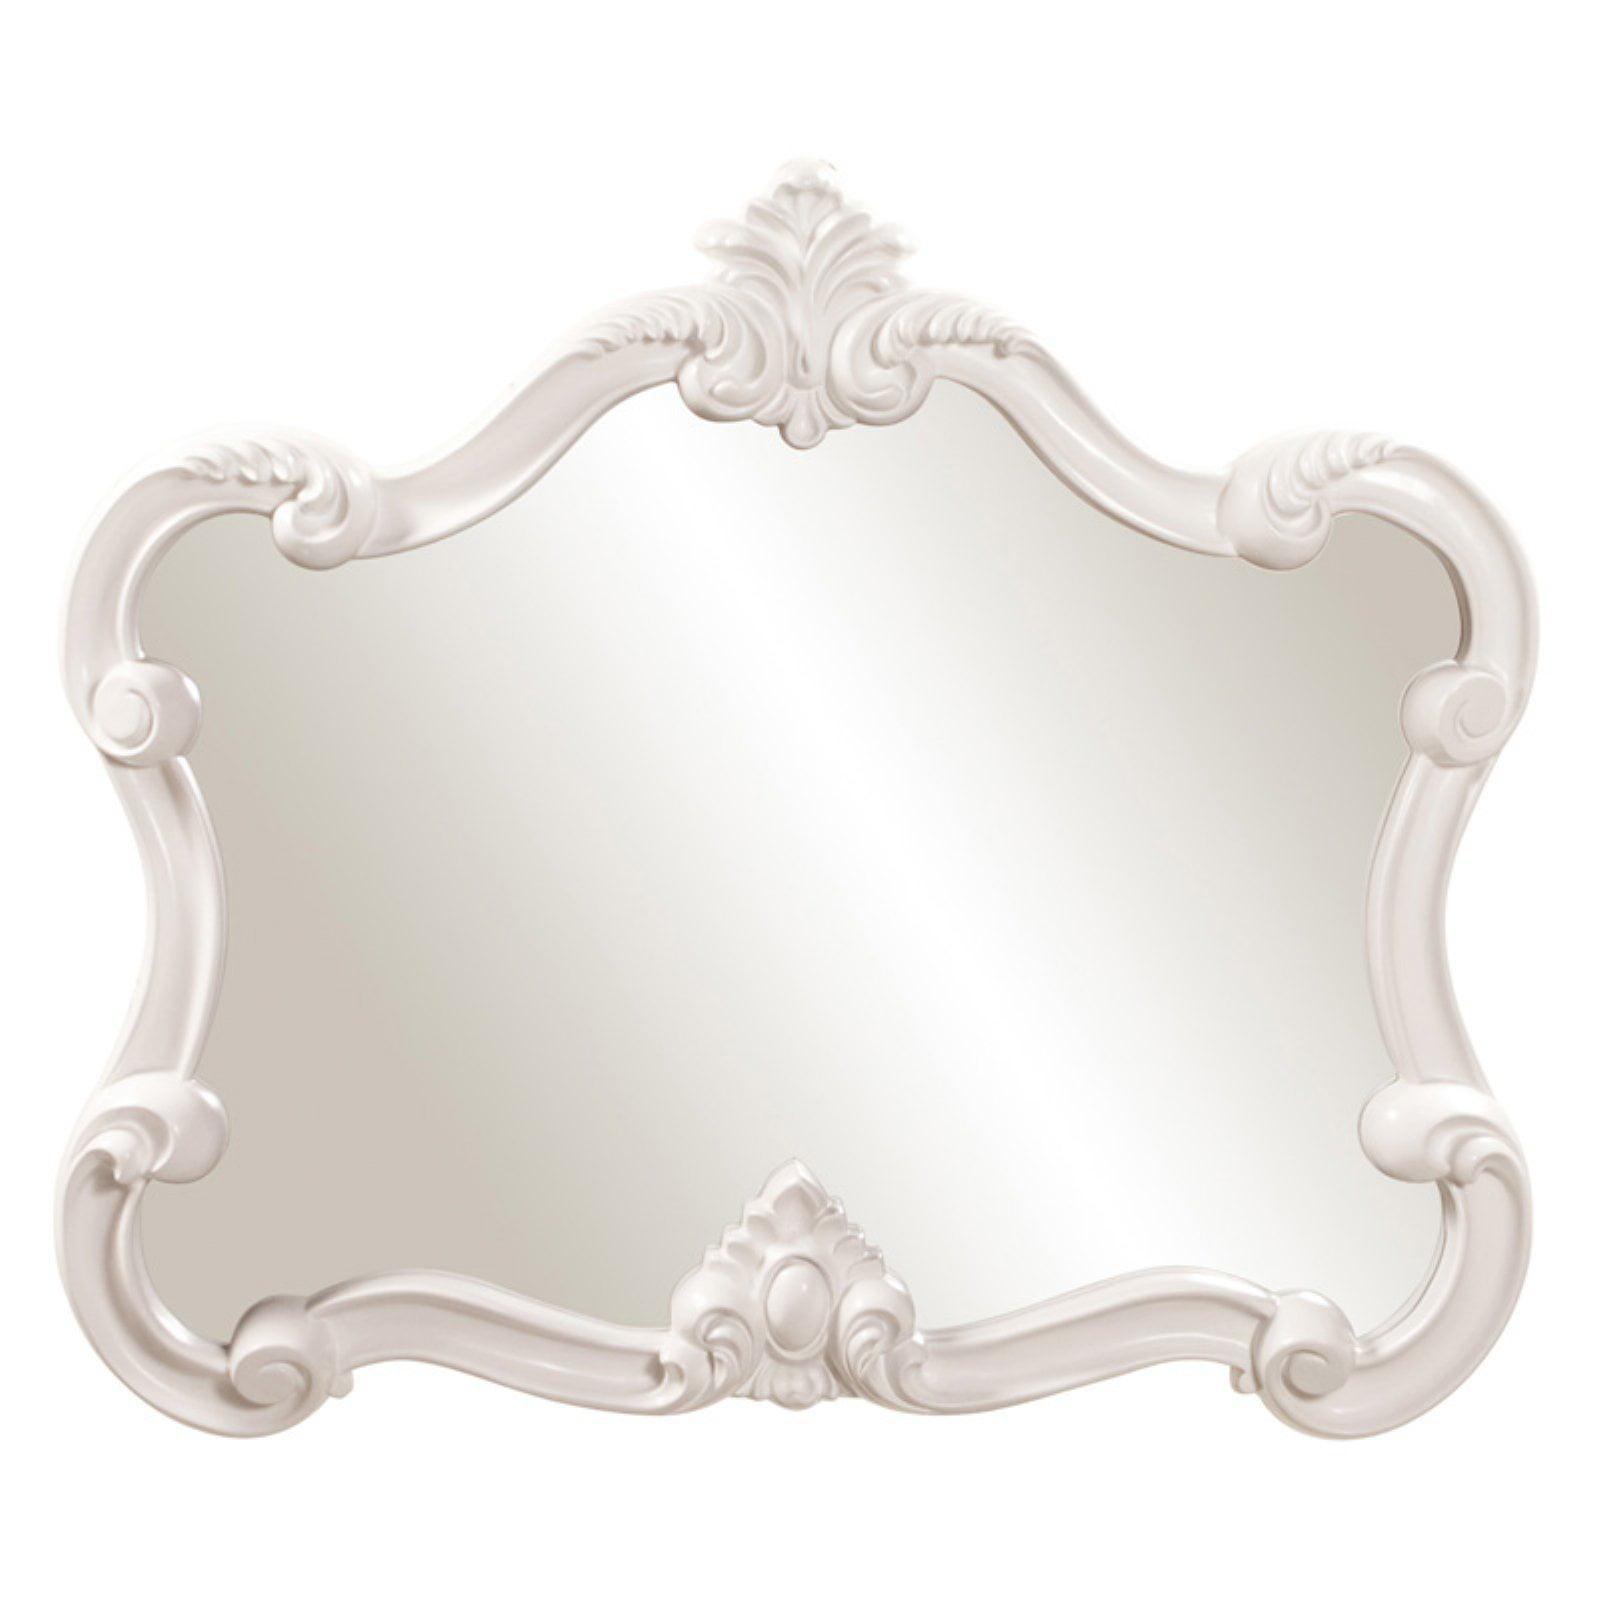 Elizabeth Austin Veruca Wall Mirror - White 32W x 28H in.